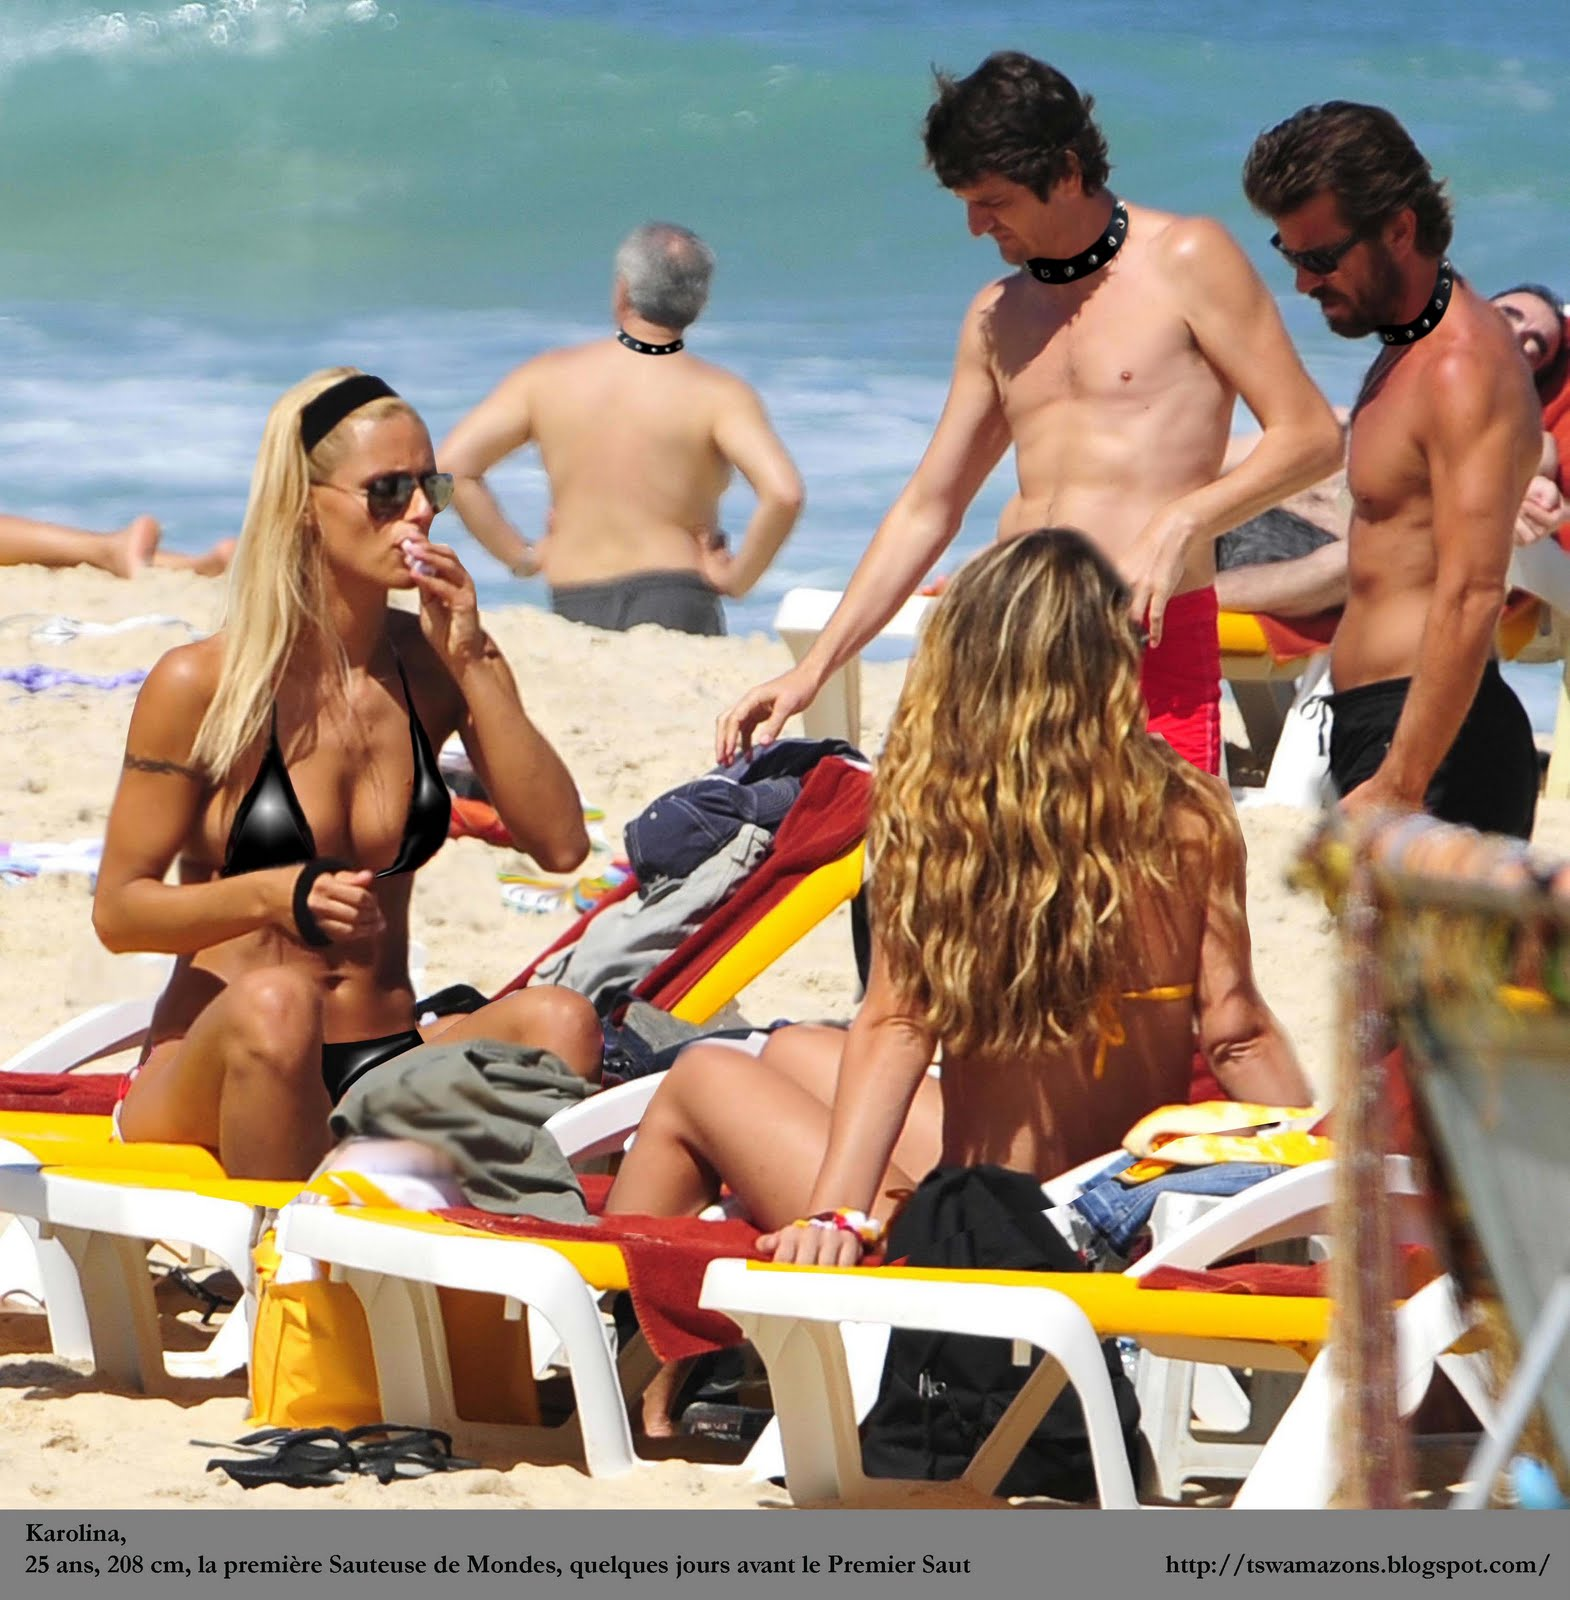 http://3.bp.blogspot.com/_YaDsPsBPEl0/TJMWflsfl0I/AAAAAAAAAhw/4aQ1nwDMChQ/s1600/beach+karolina.jpg